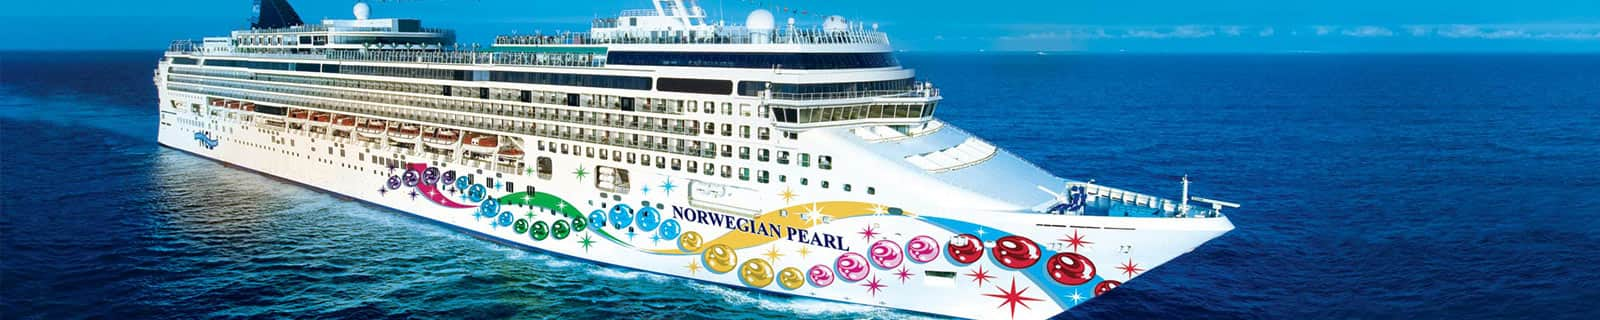 Norwegian Pearl Cruise Ship Norwegian Pearl Deck Plans Norwegian Cruise Line